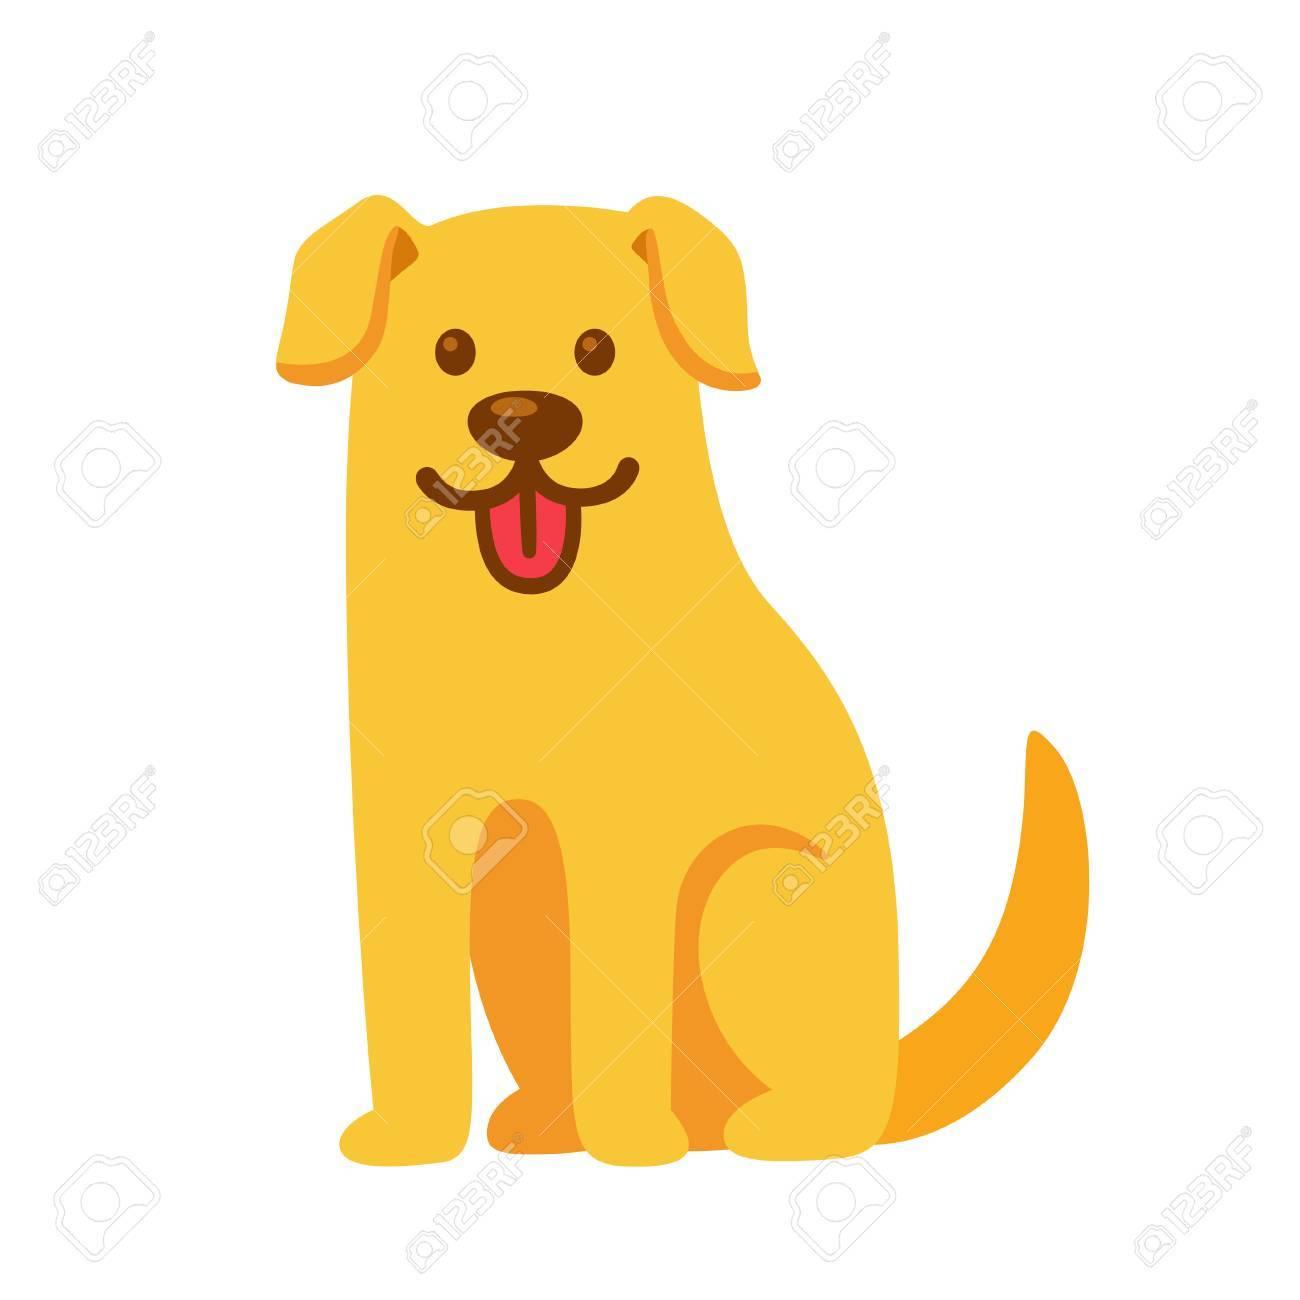 Funny Cartoon Golden Retriever Drawing Cute Pet Labrador Vector